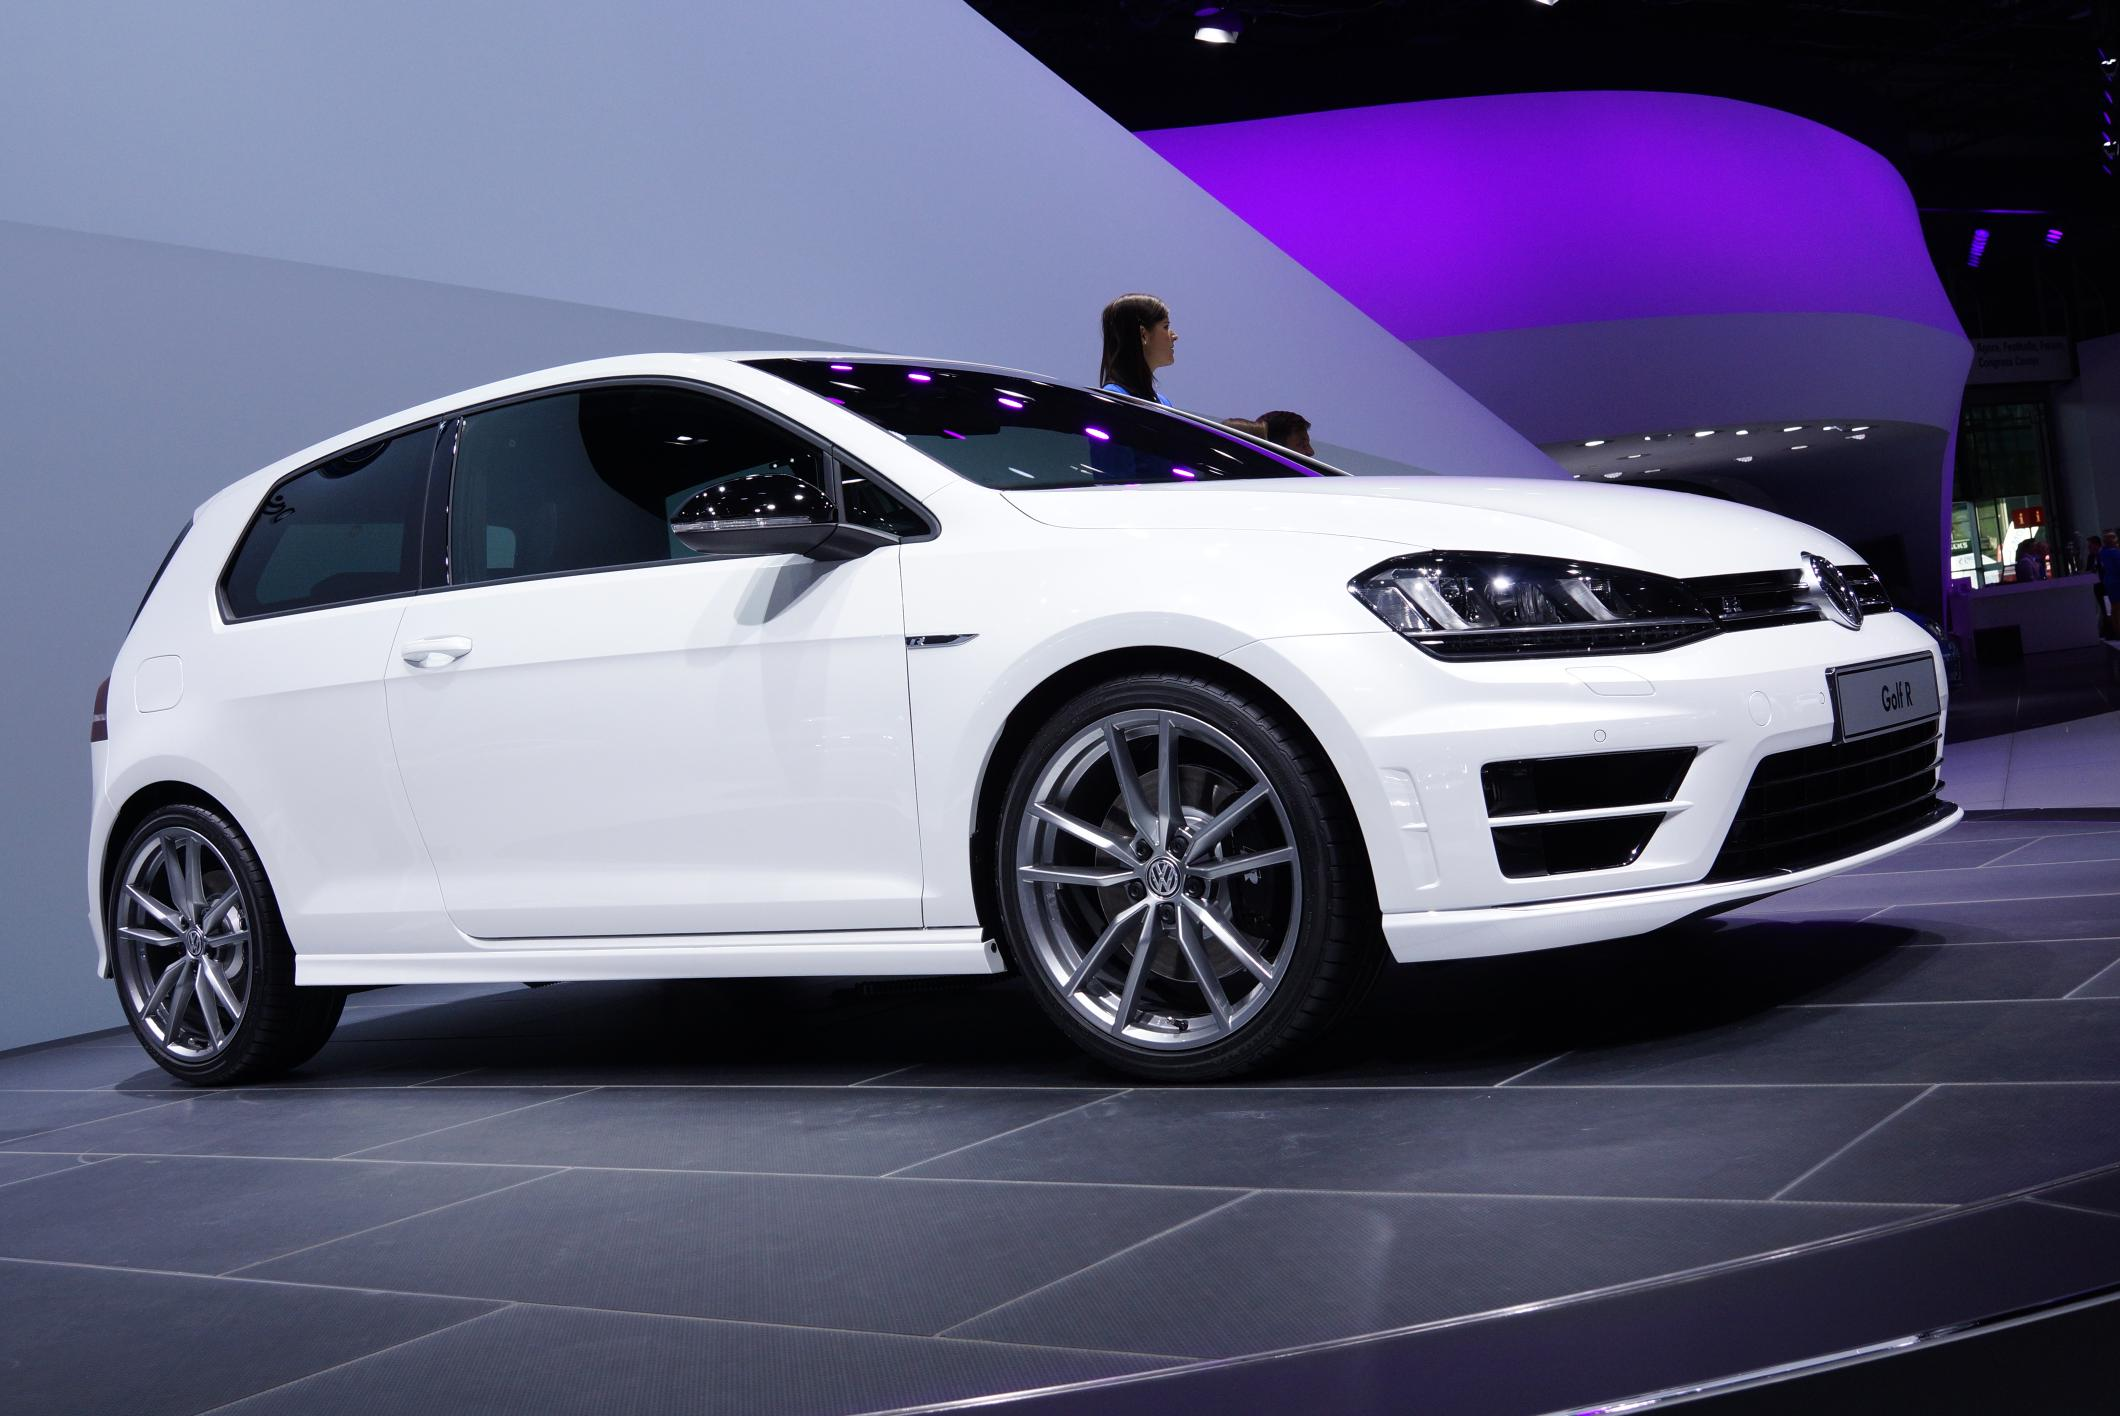 2014 Volkswagen Golf R 2013 Frankfurt Motor Show